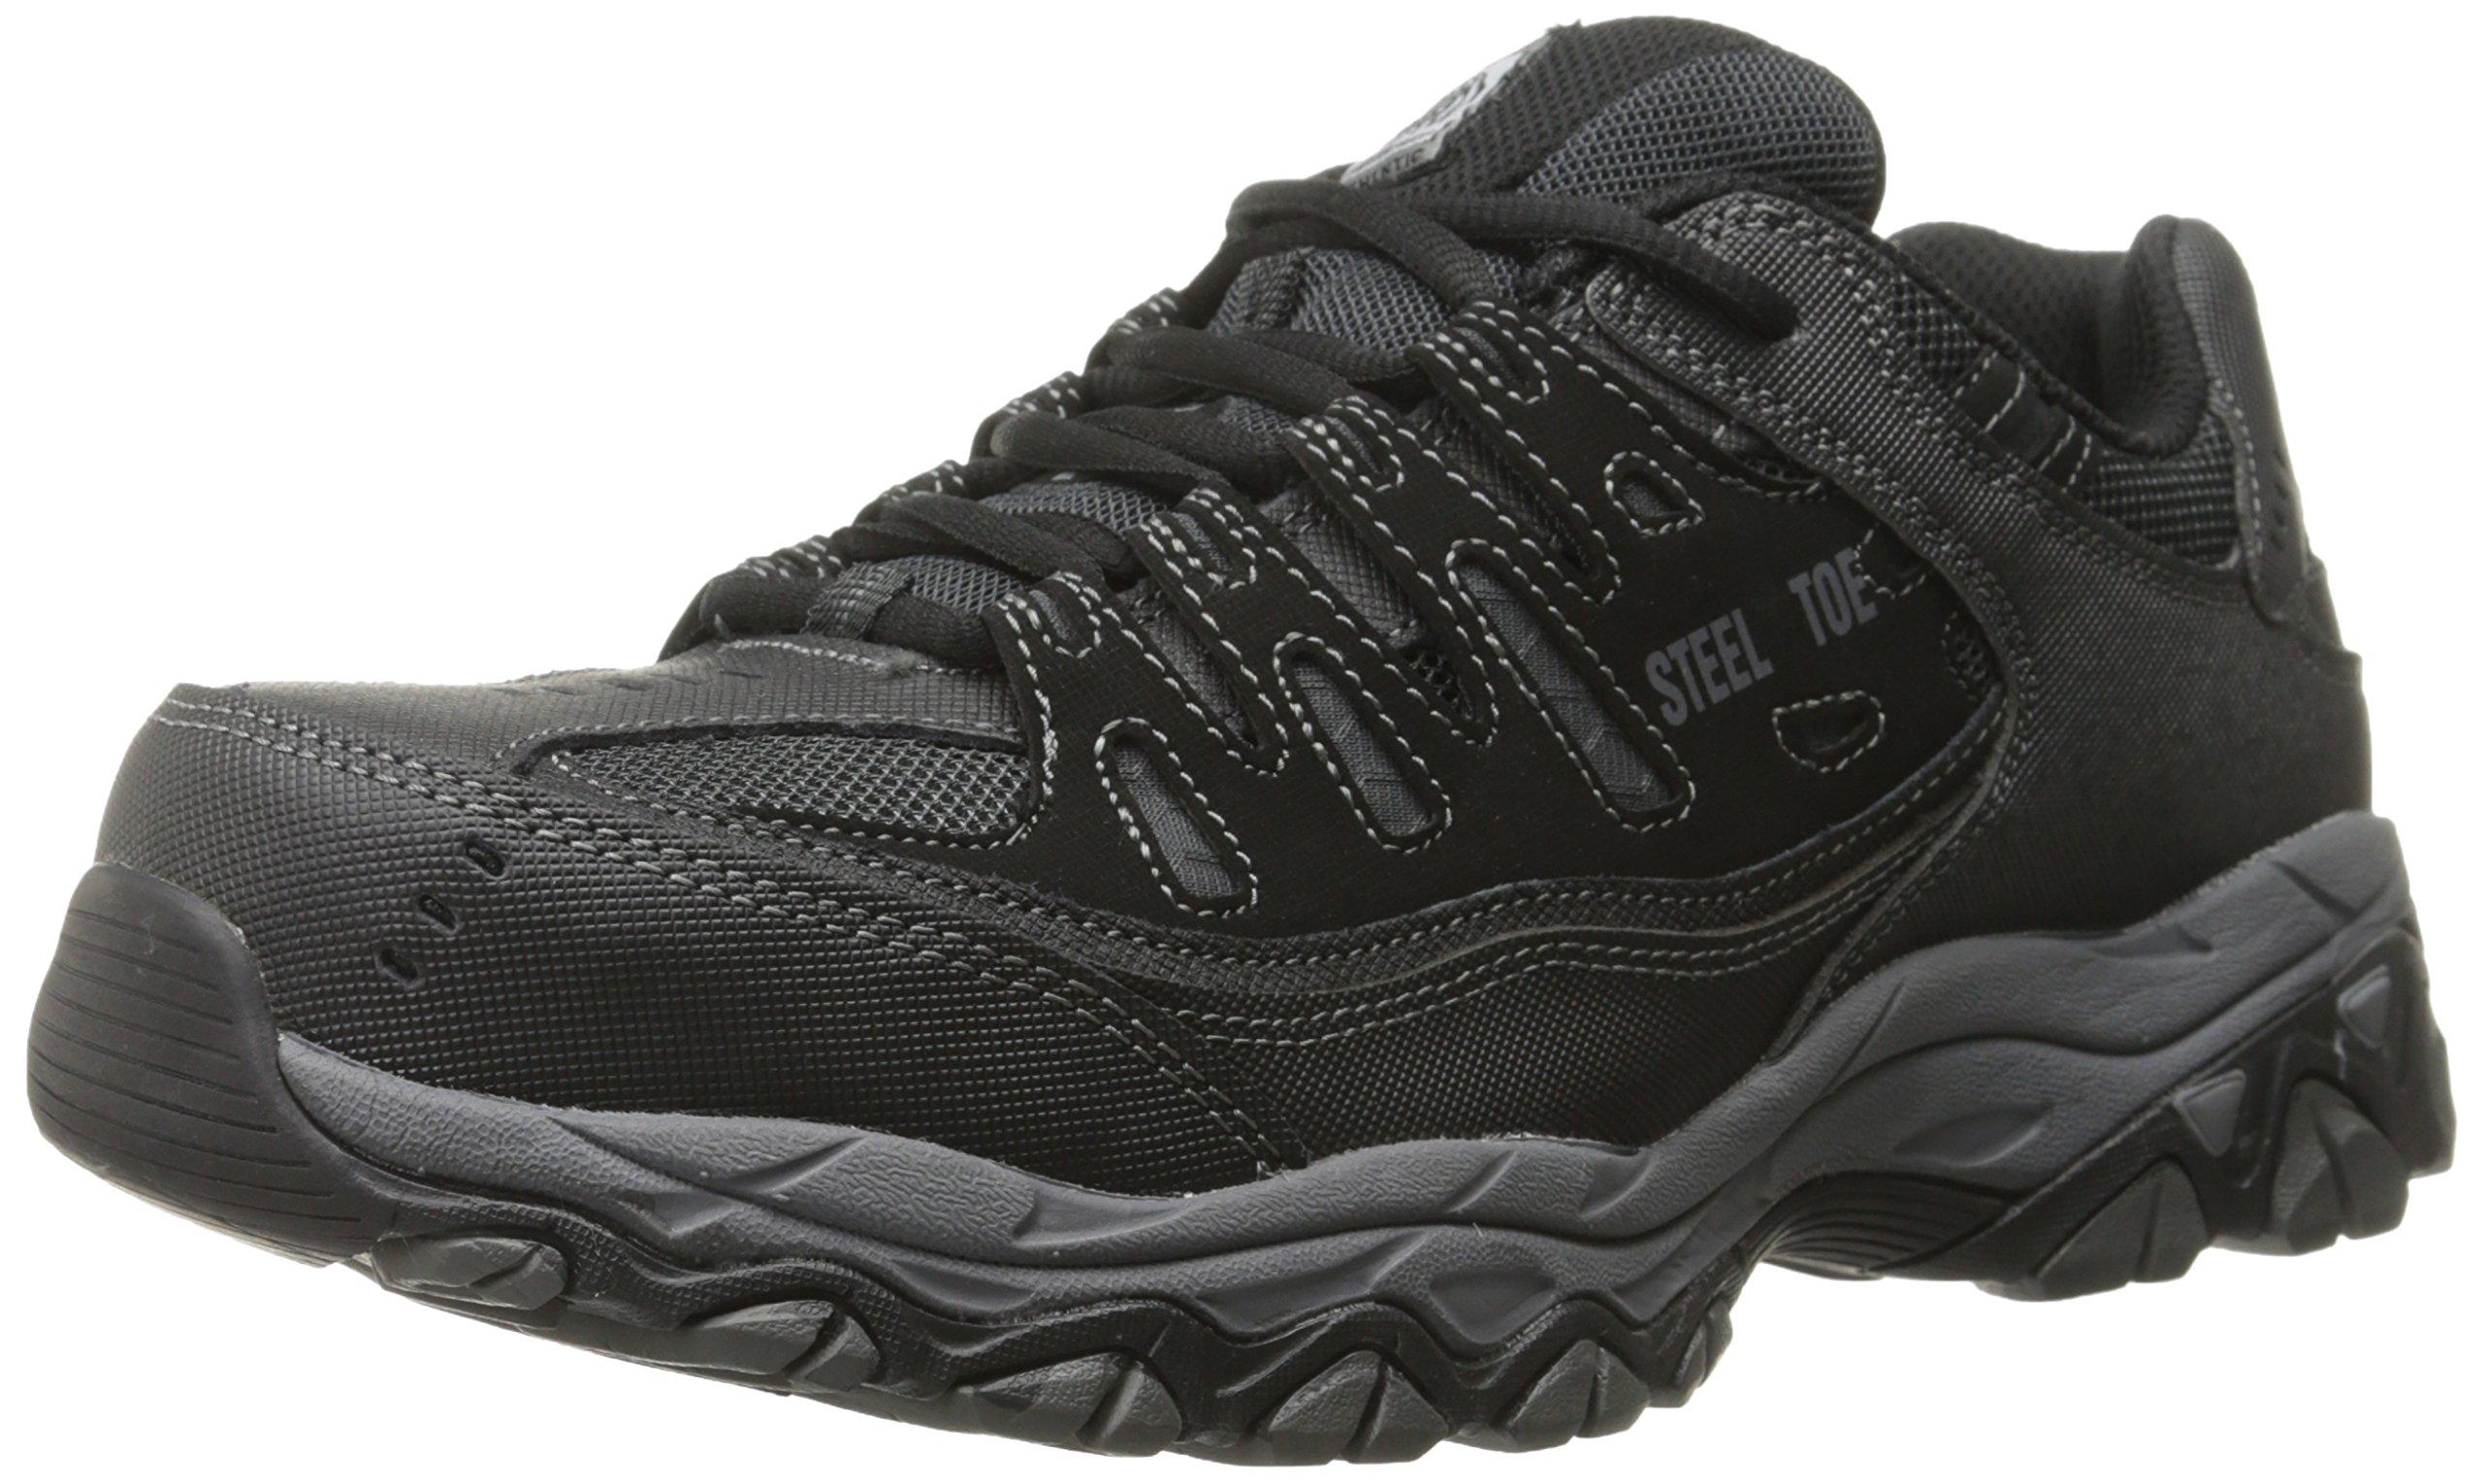 Skechers for Casual Steel Toe Work Sneaker, Black/Charcoal, 12 M US by Skechers